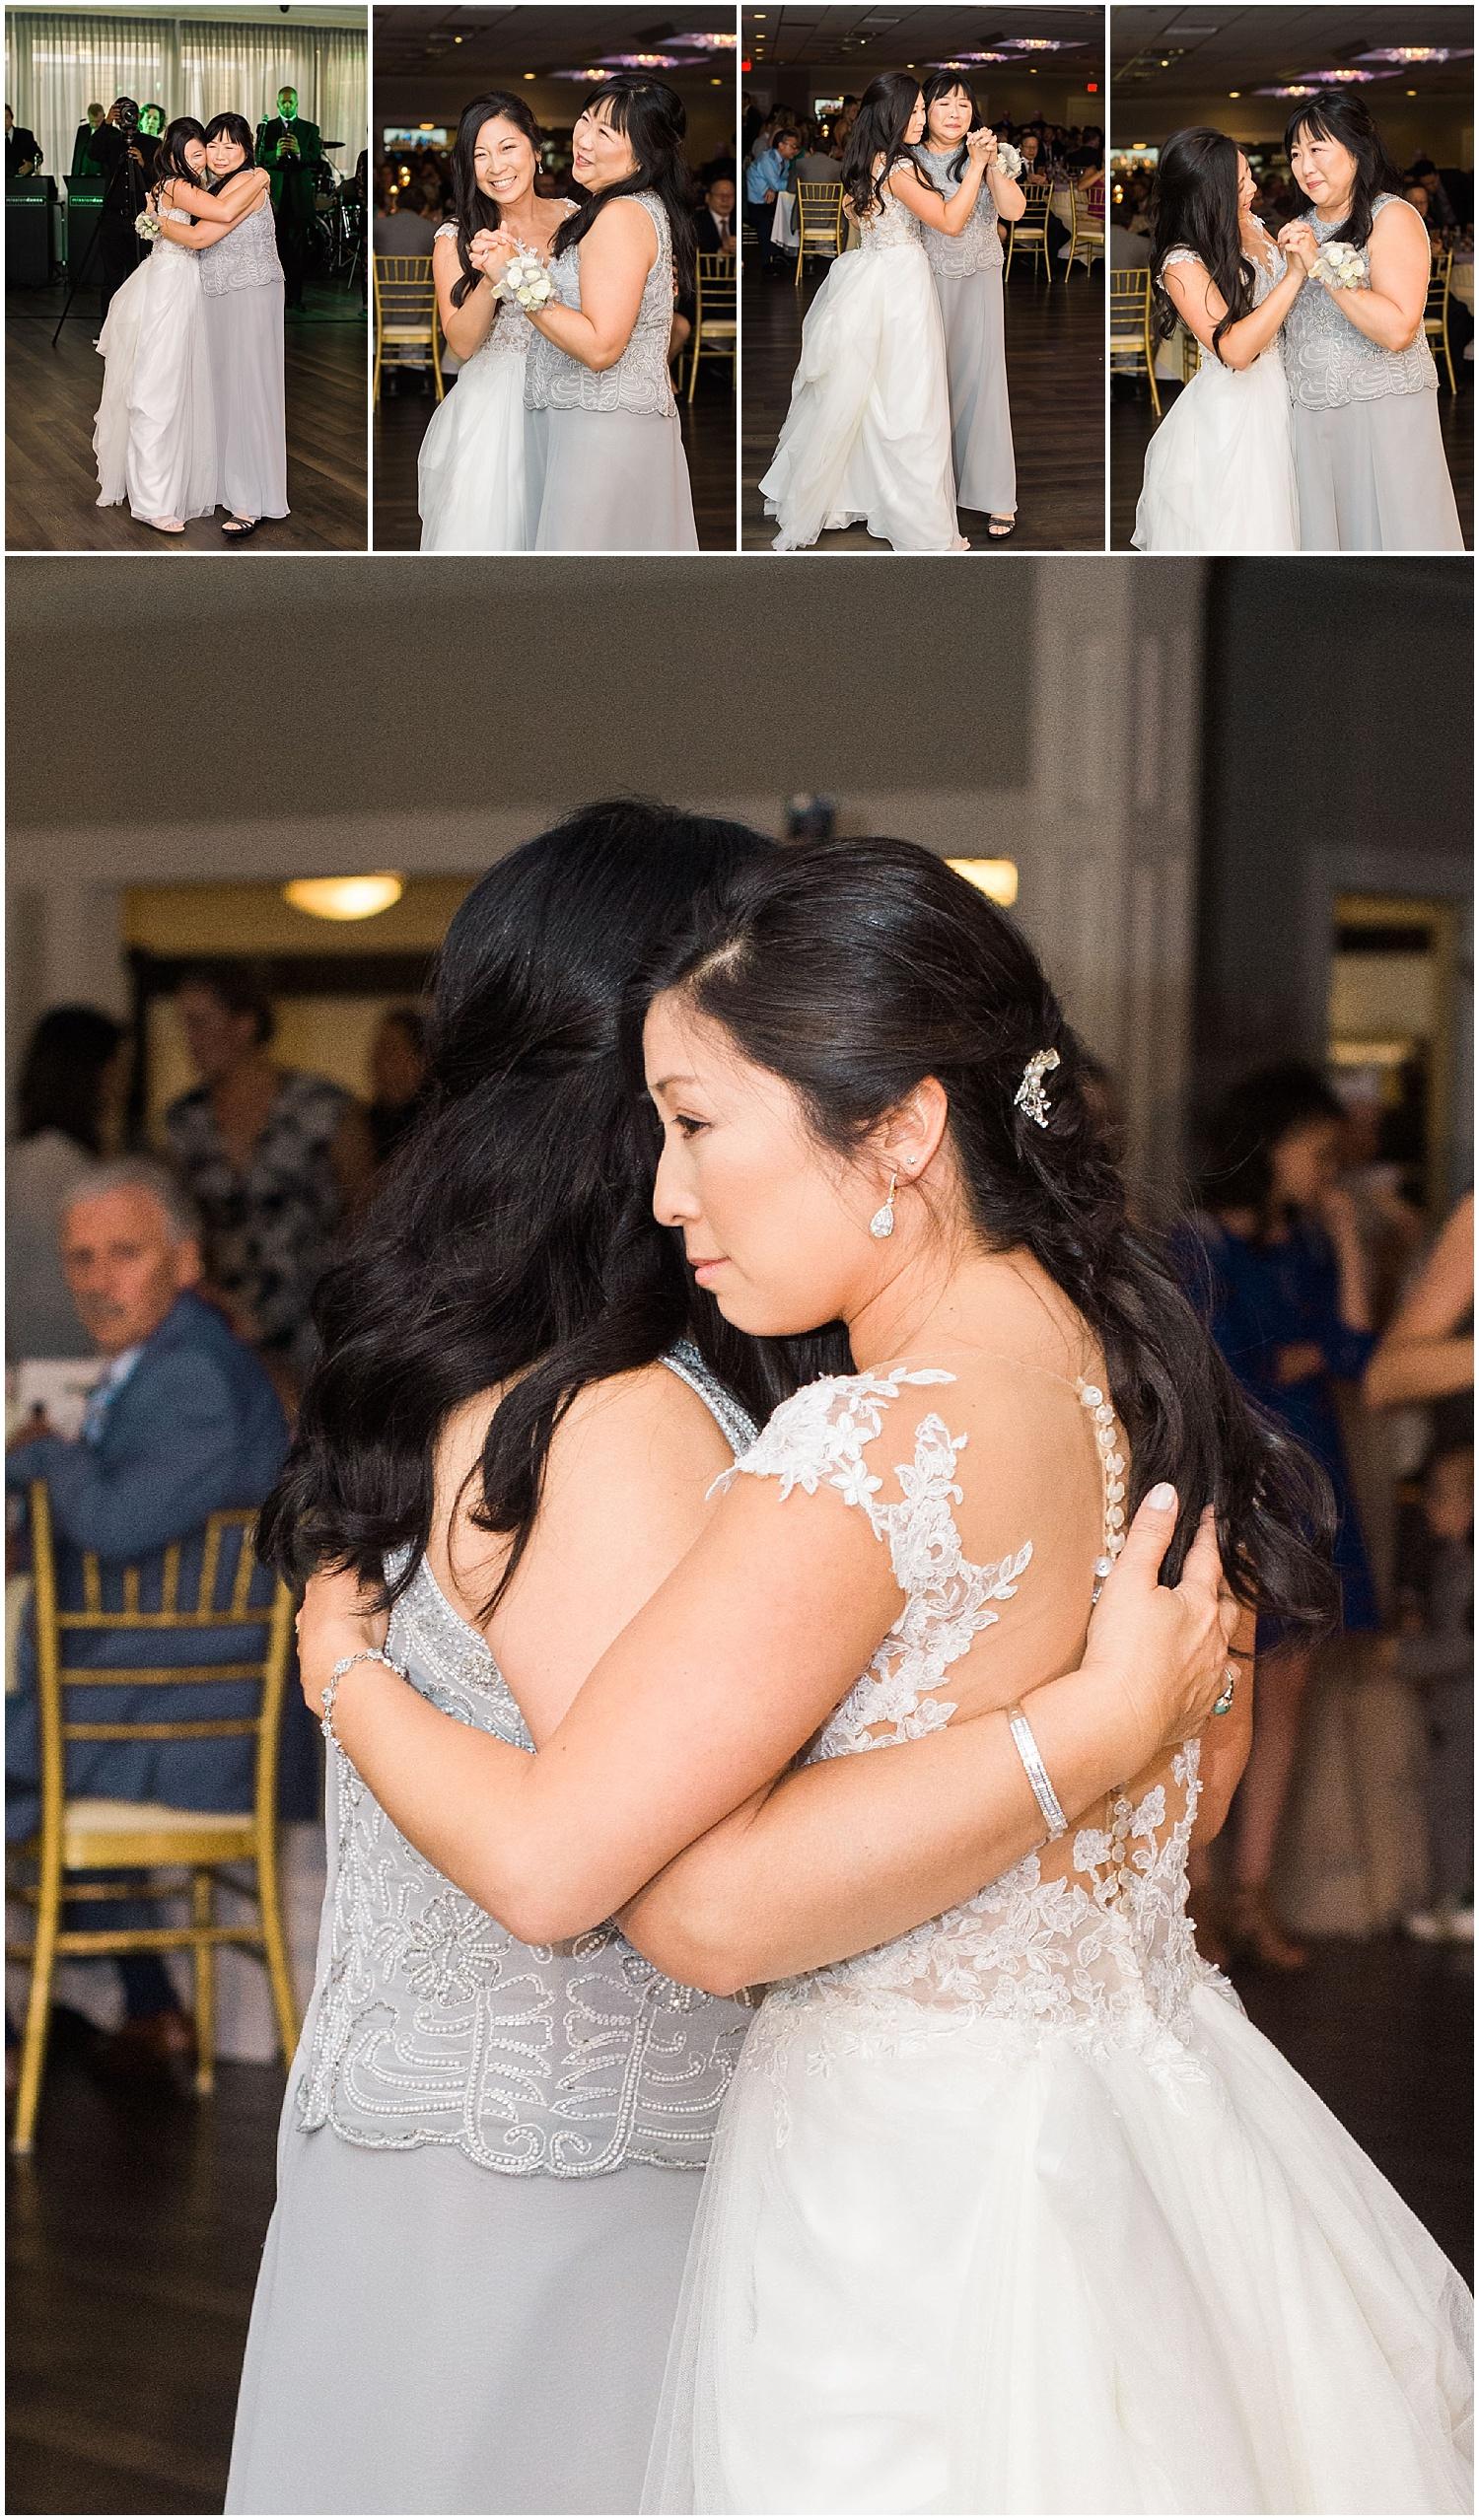 new jersey outdoor wedding, Monmouth University Wilson Hall, natural light photographer, hybrid photographer, mother daughter dance